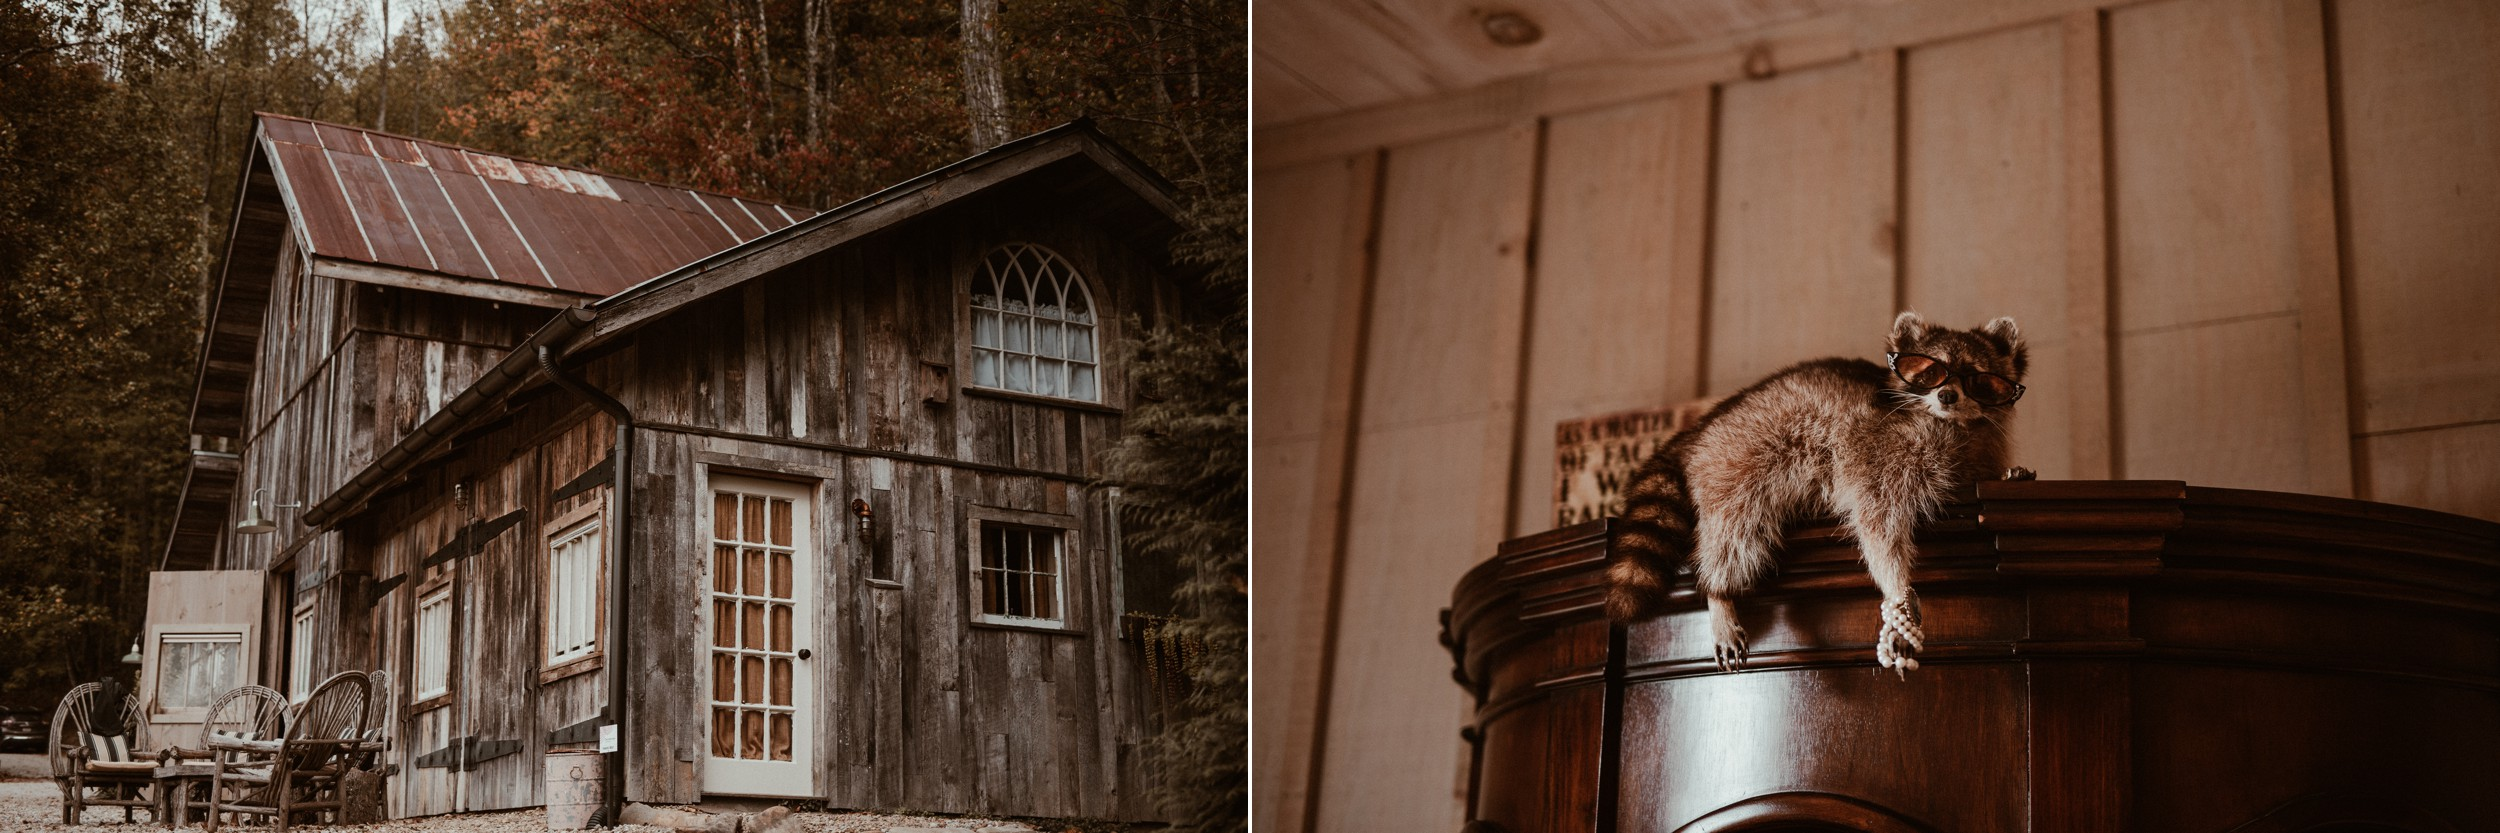 north-carolina-fall-vineyard-wedding-vanessaalvesphotography-23.jpg